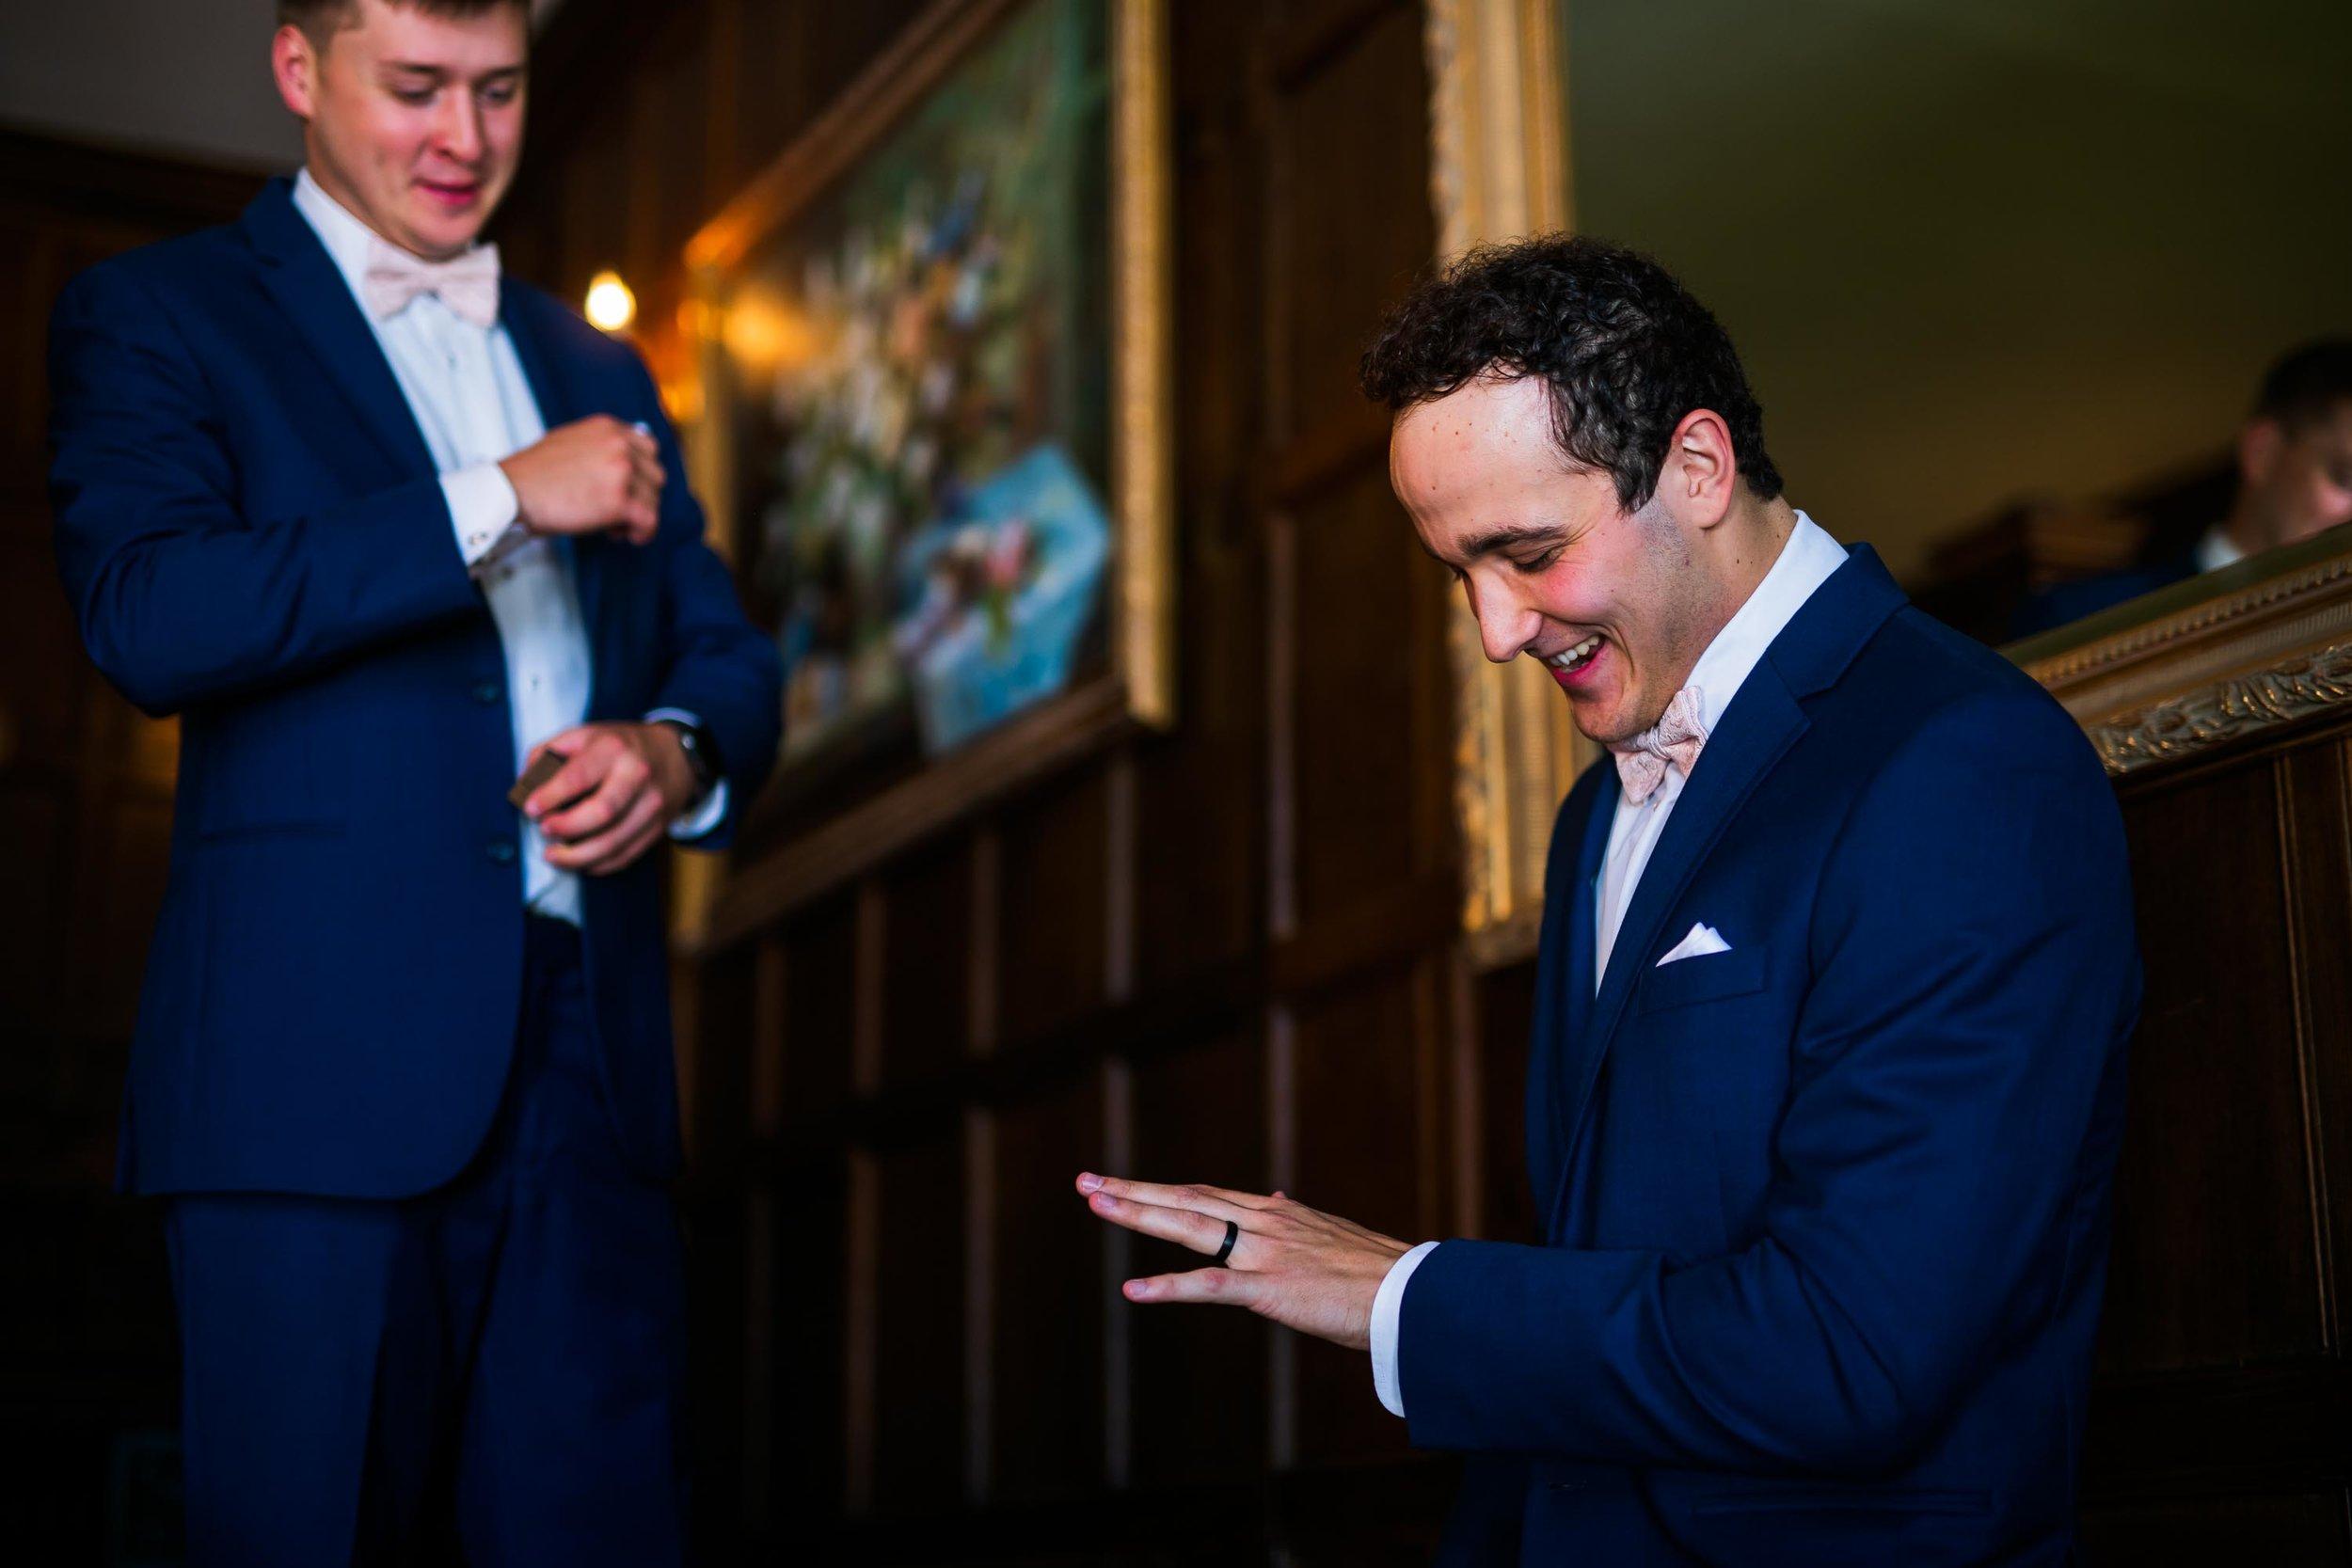 thornewood castle wedding 7.jpg